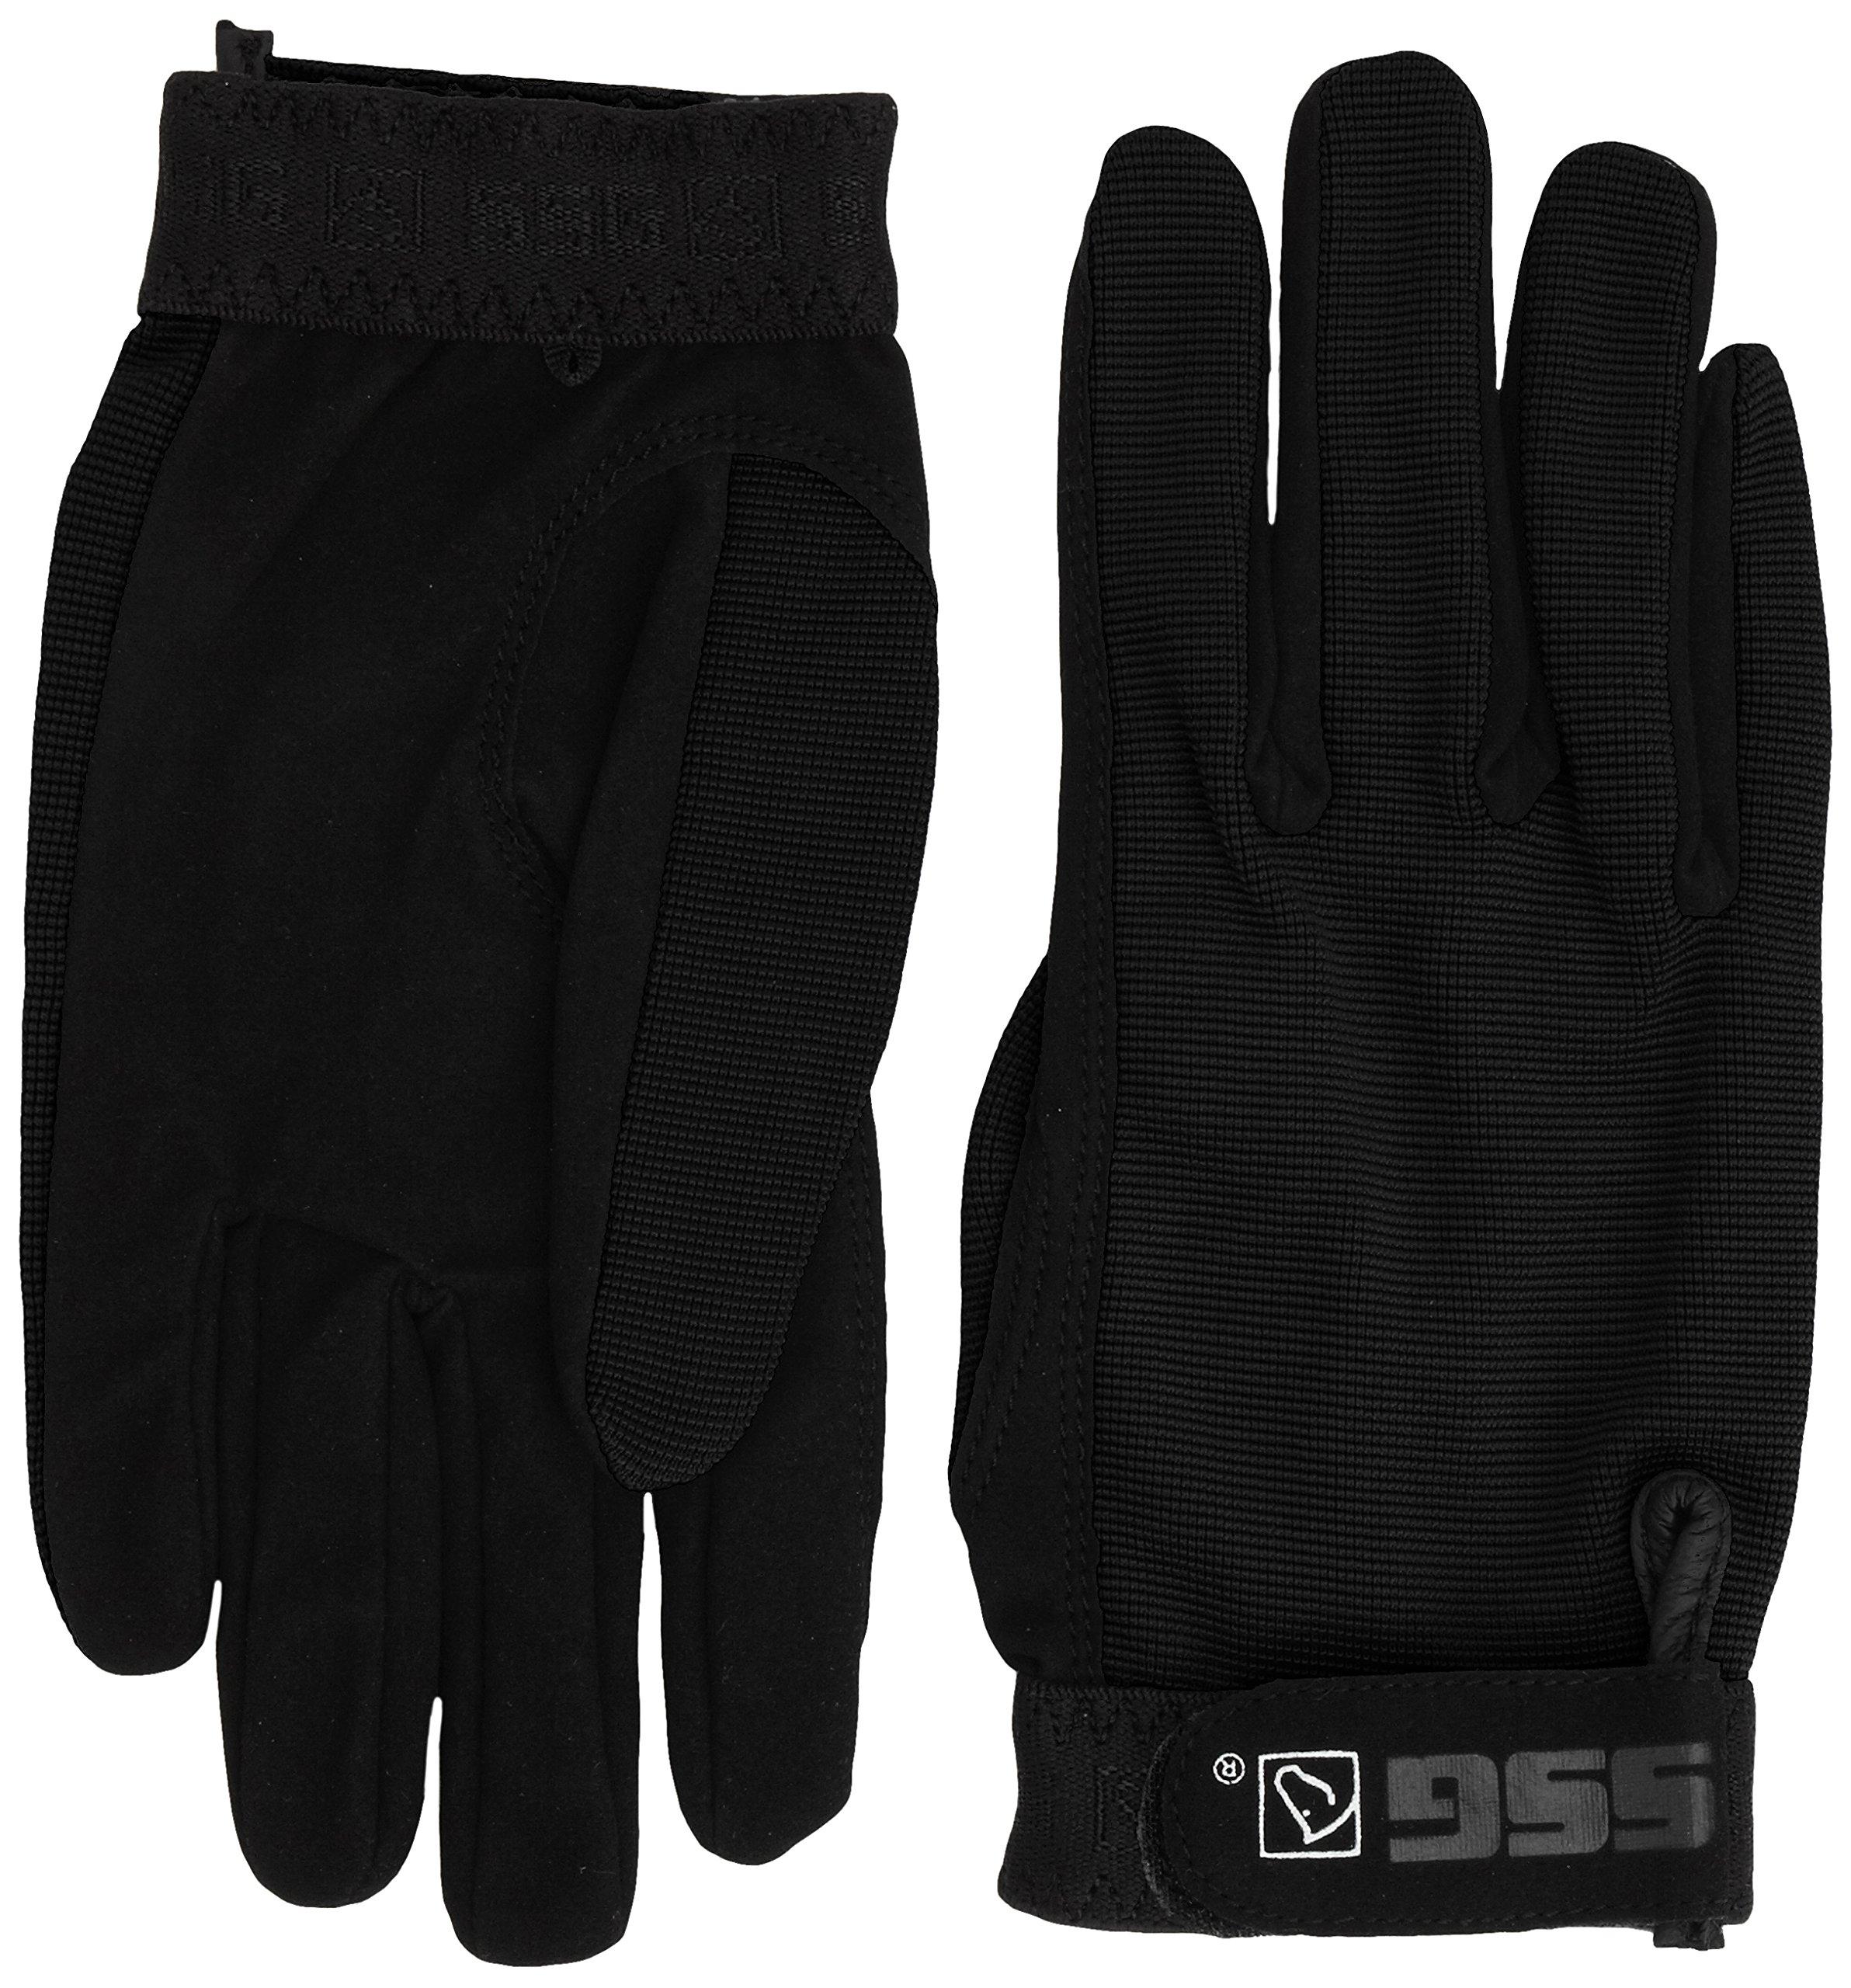 SSG All Weather Gloves Black